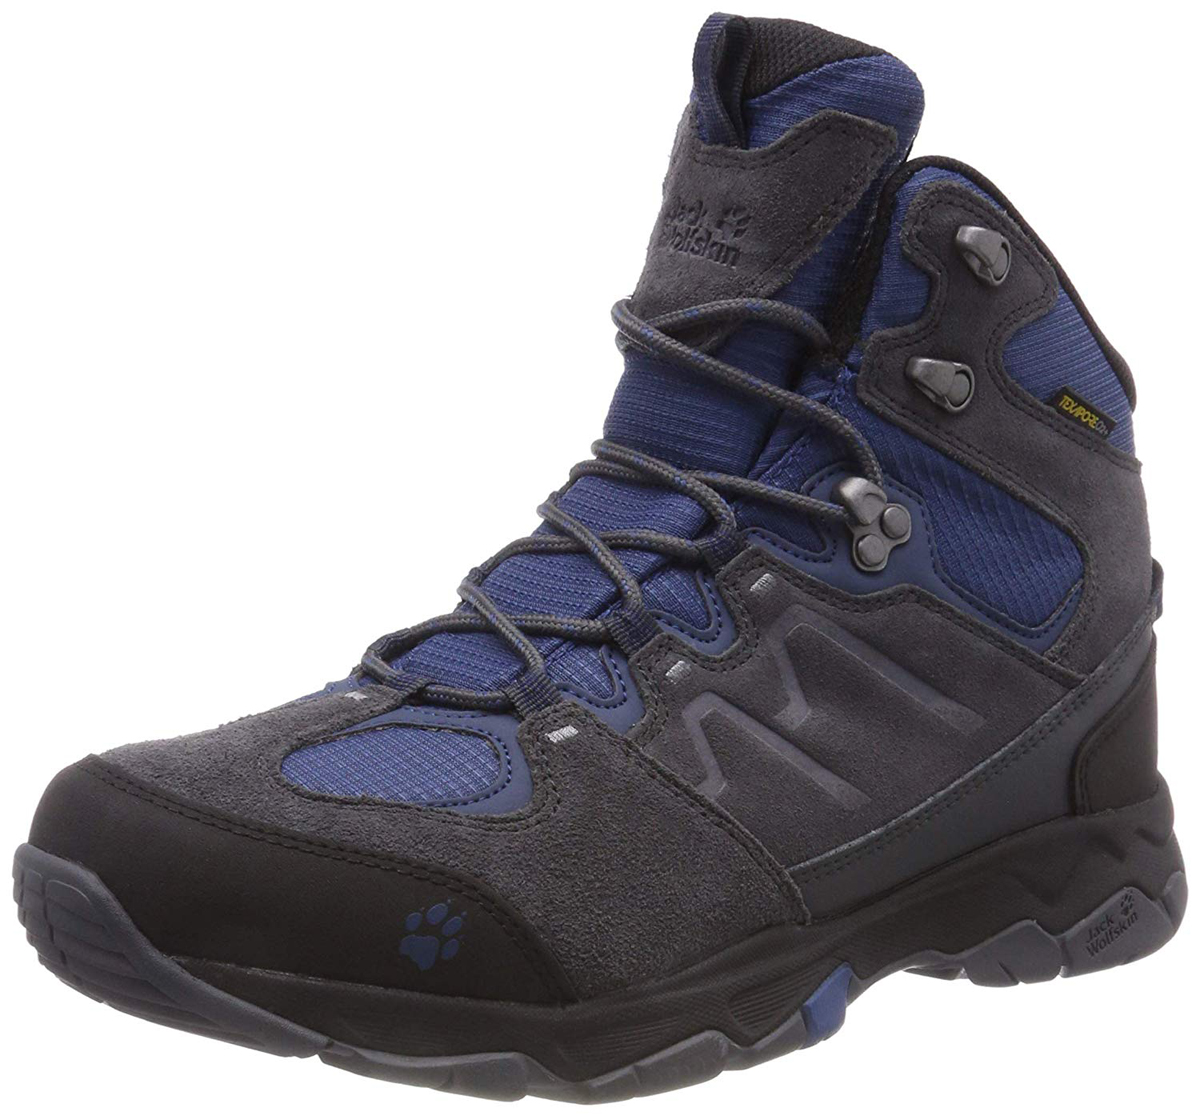 все цены на Ботинки Jack Wolfskin Mtn Attack 6 Texapore Mid M онлайн